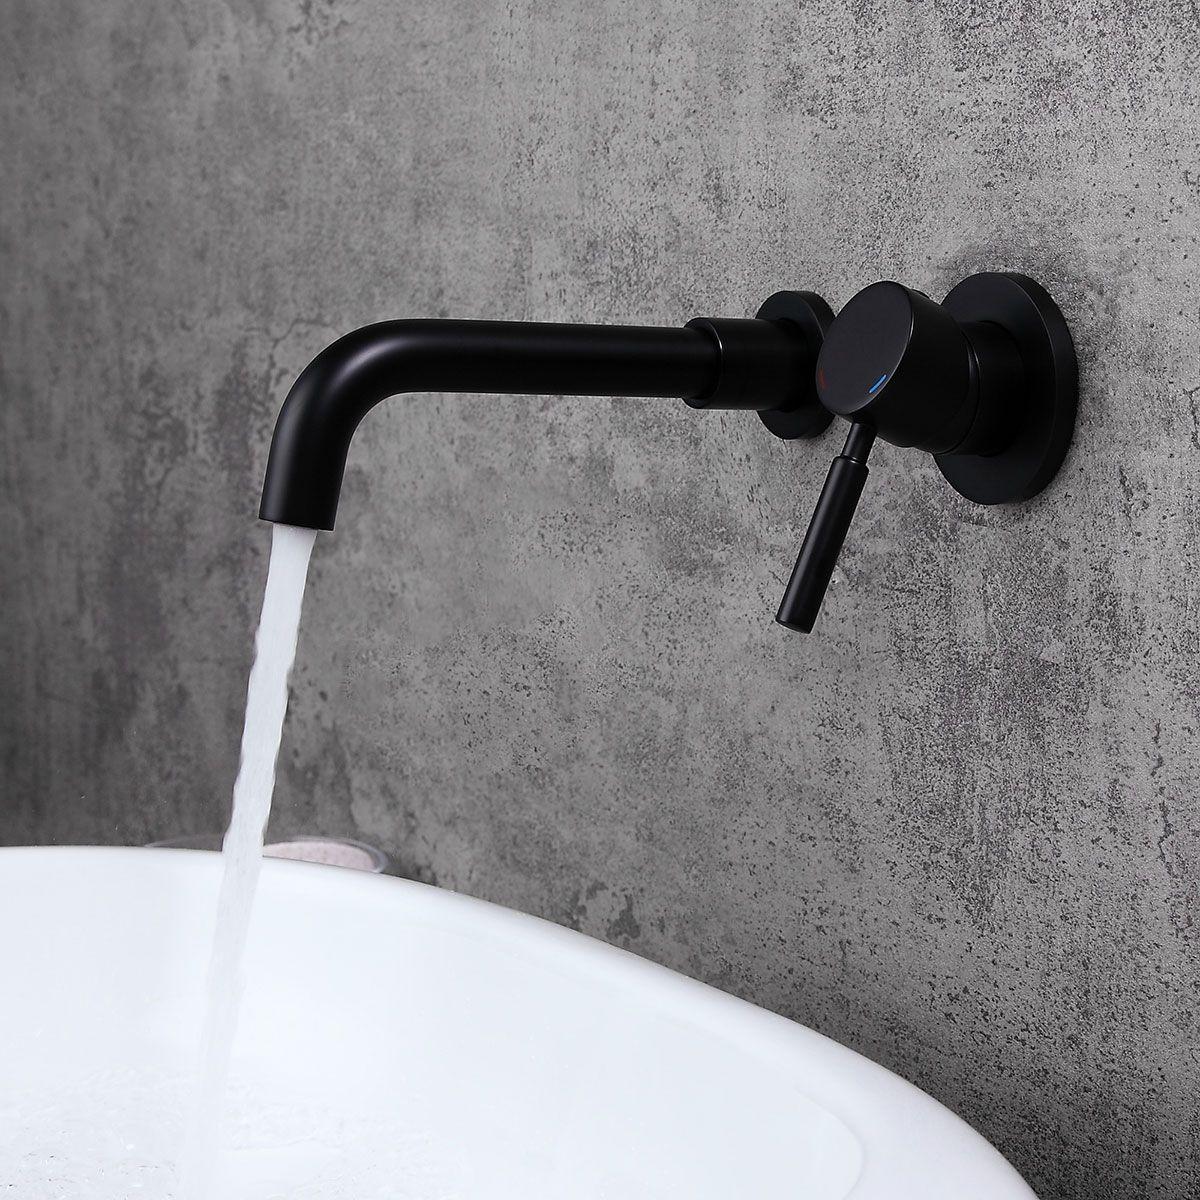 Stev Solid Brass Modern Wall Mount Bathroom Sink Faucet With Single Handle In Matte Black In 2020 Wall Mounted Bathroom Sinks Bathroom Sink Faucets Wall Mount Faucet Bathroom Sink